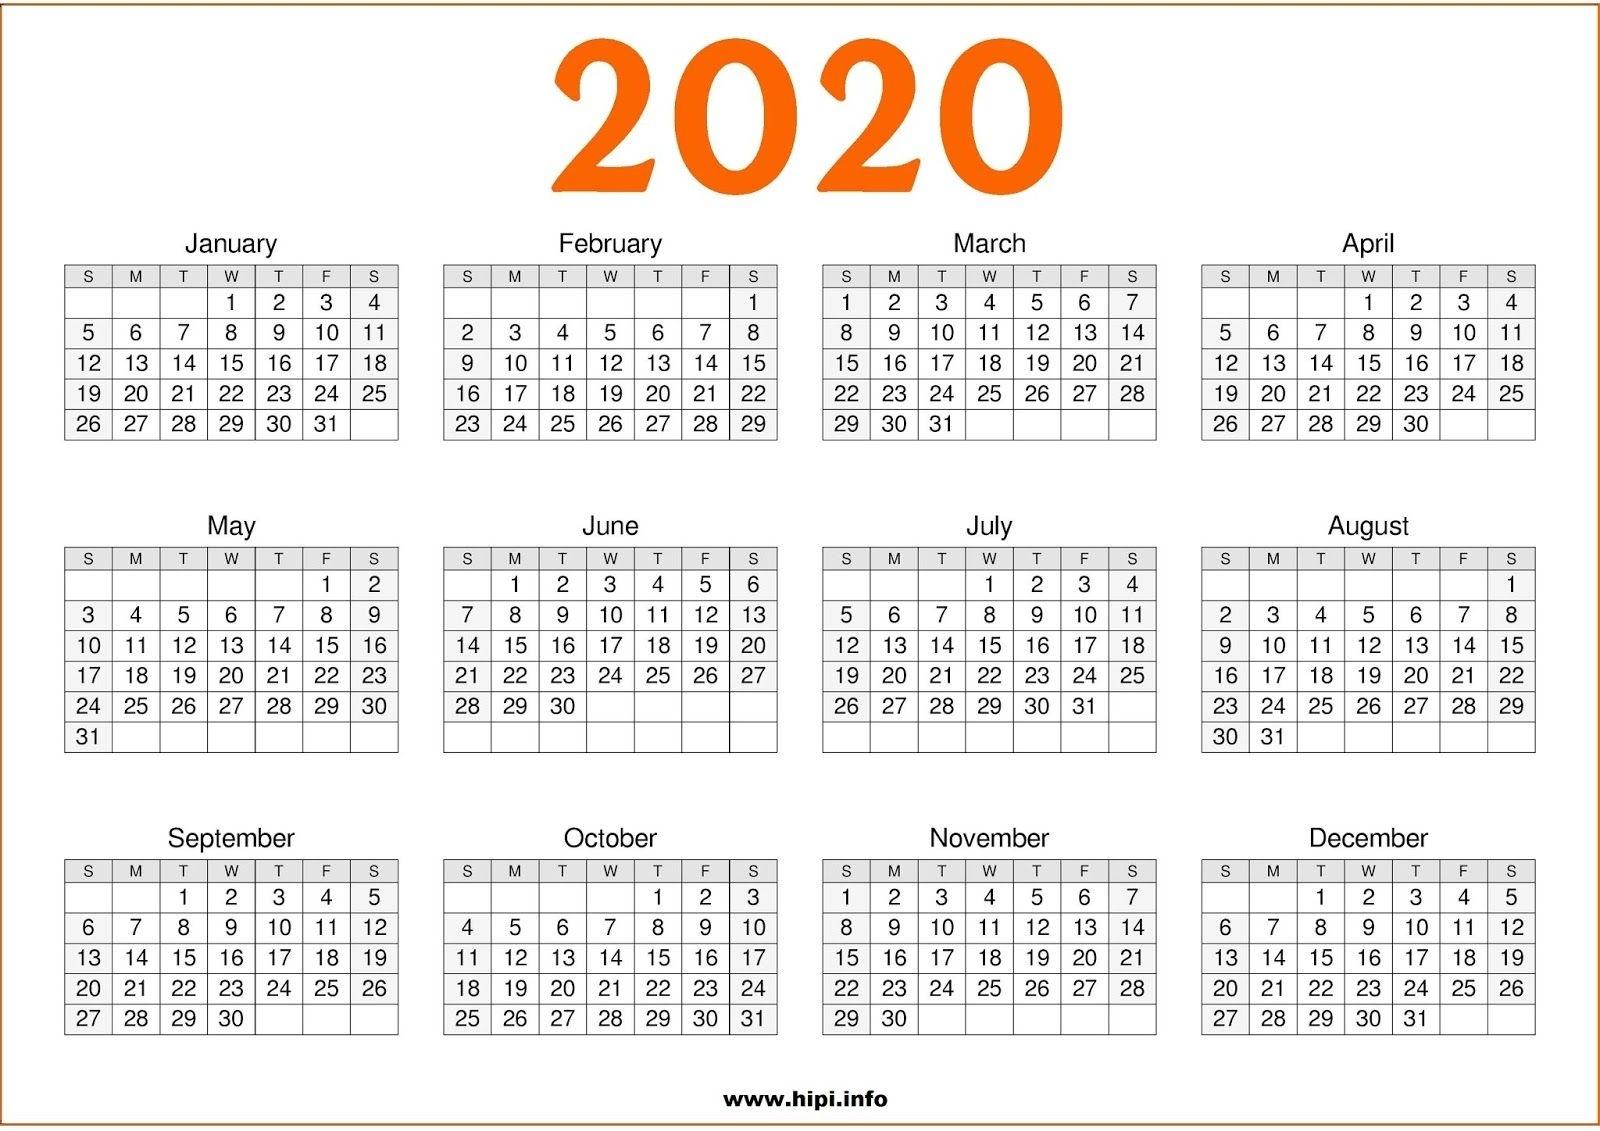 Printable Calendar 2020 One Page - Cerno.mioduchowski